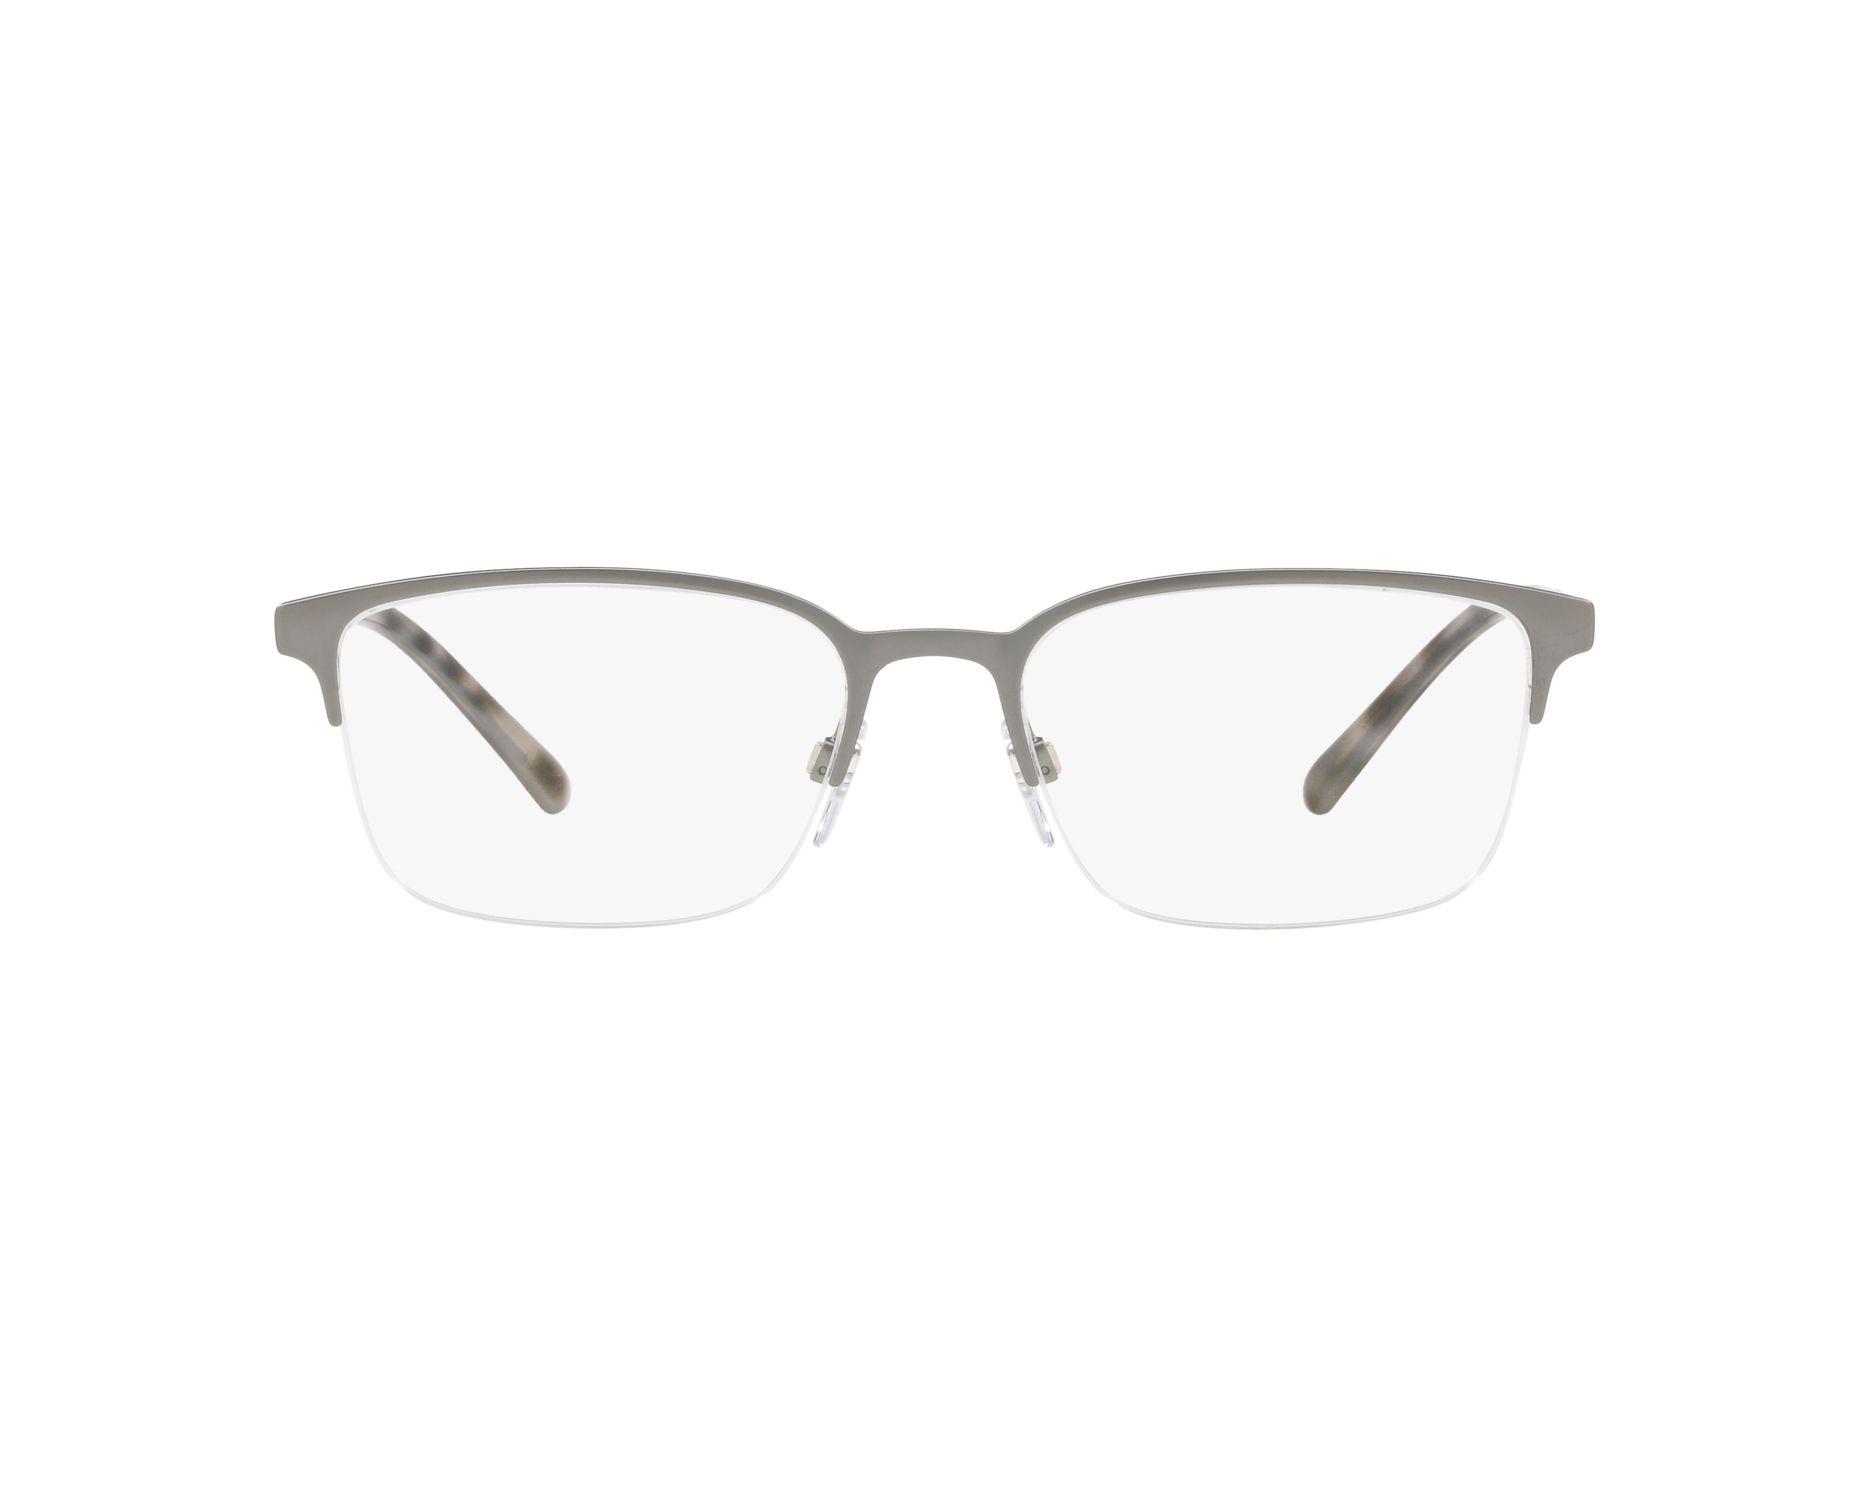 eyeglasses Burberry BE-1323 1014 54-18 Gun Grey 360 degree view 1